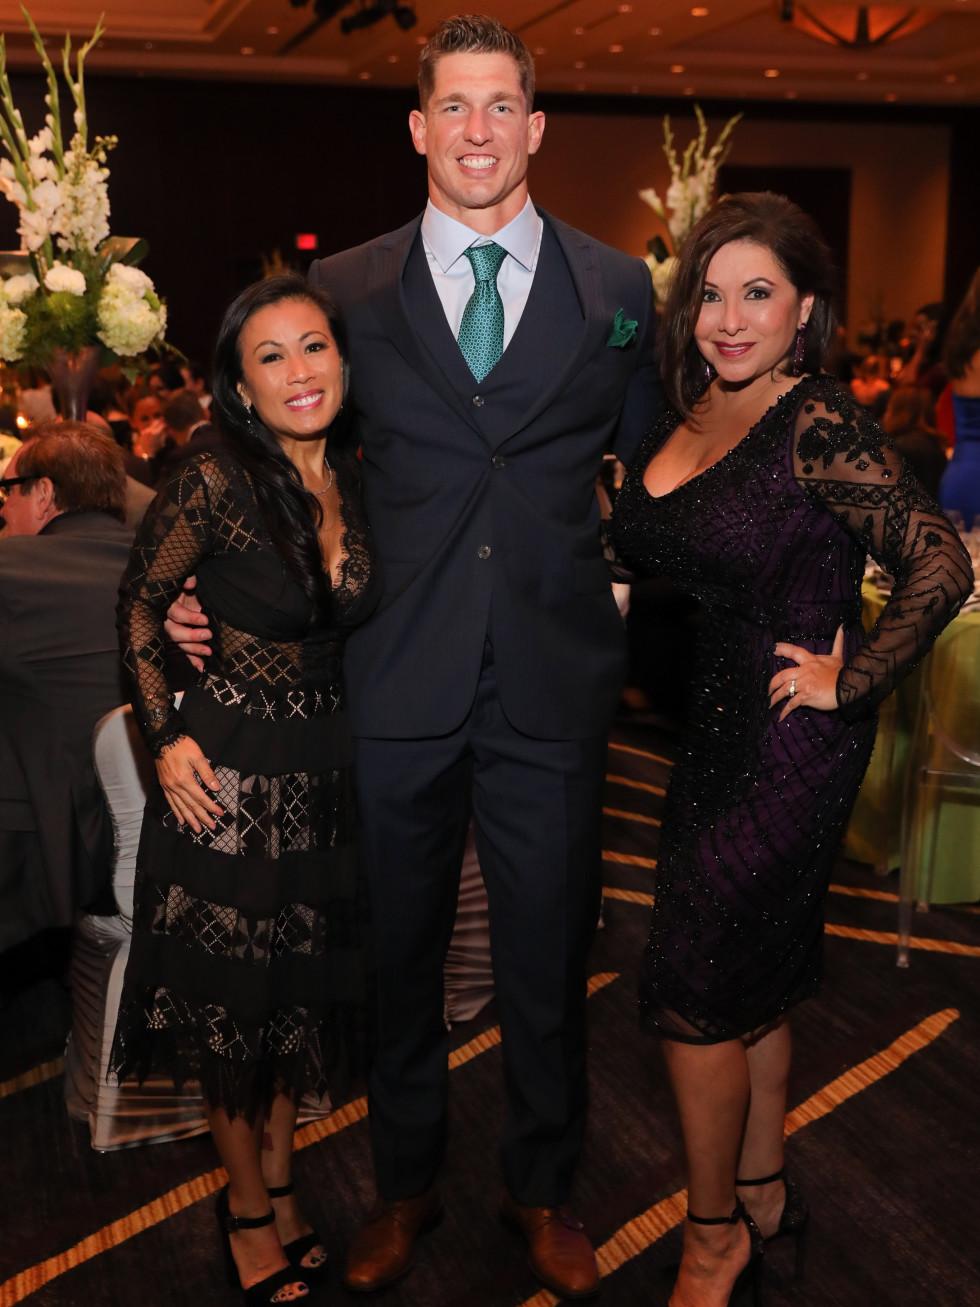 Chau, Brian and Debbie at Festari Gala